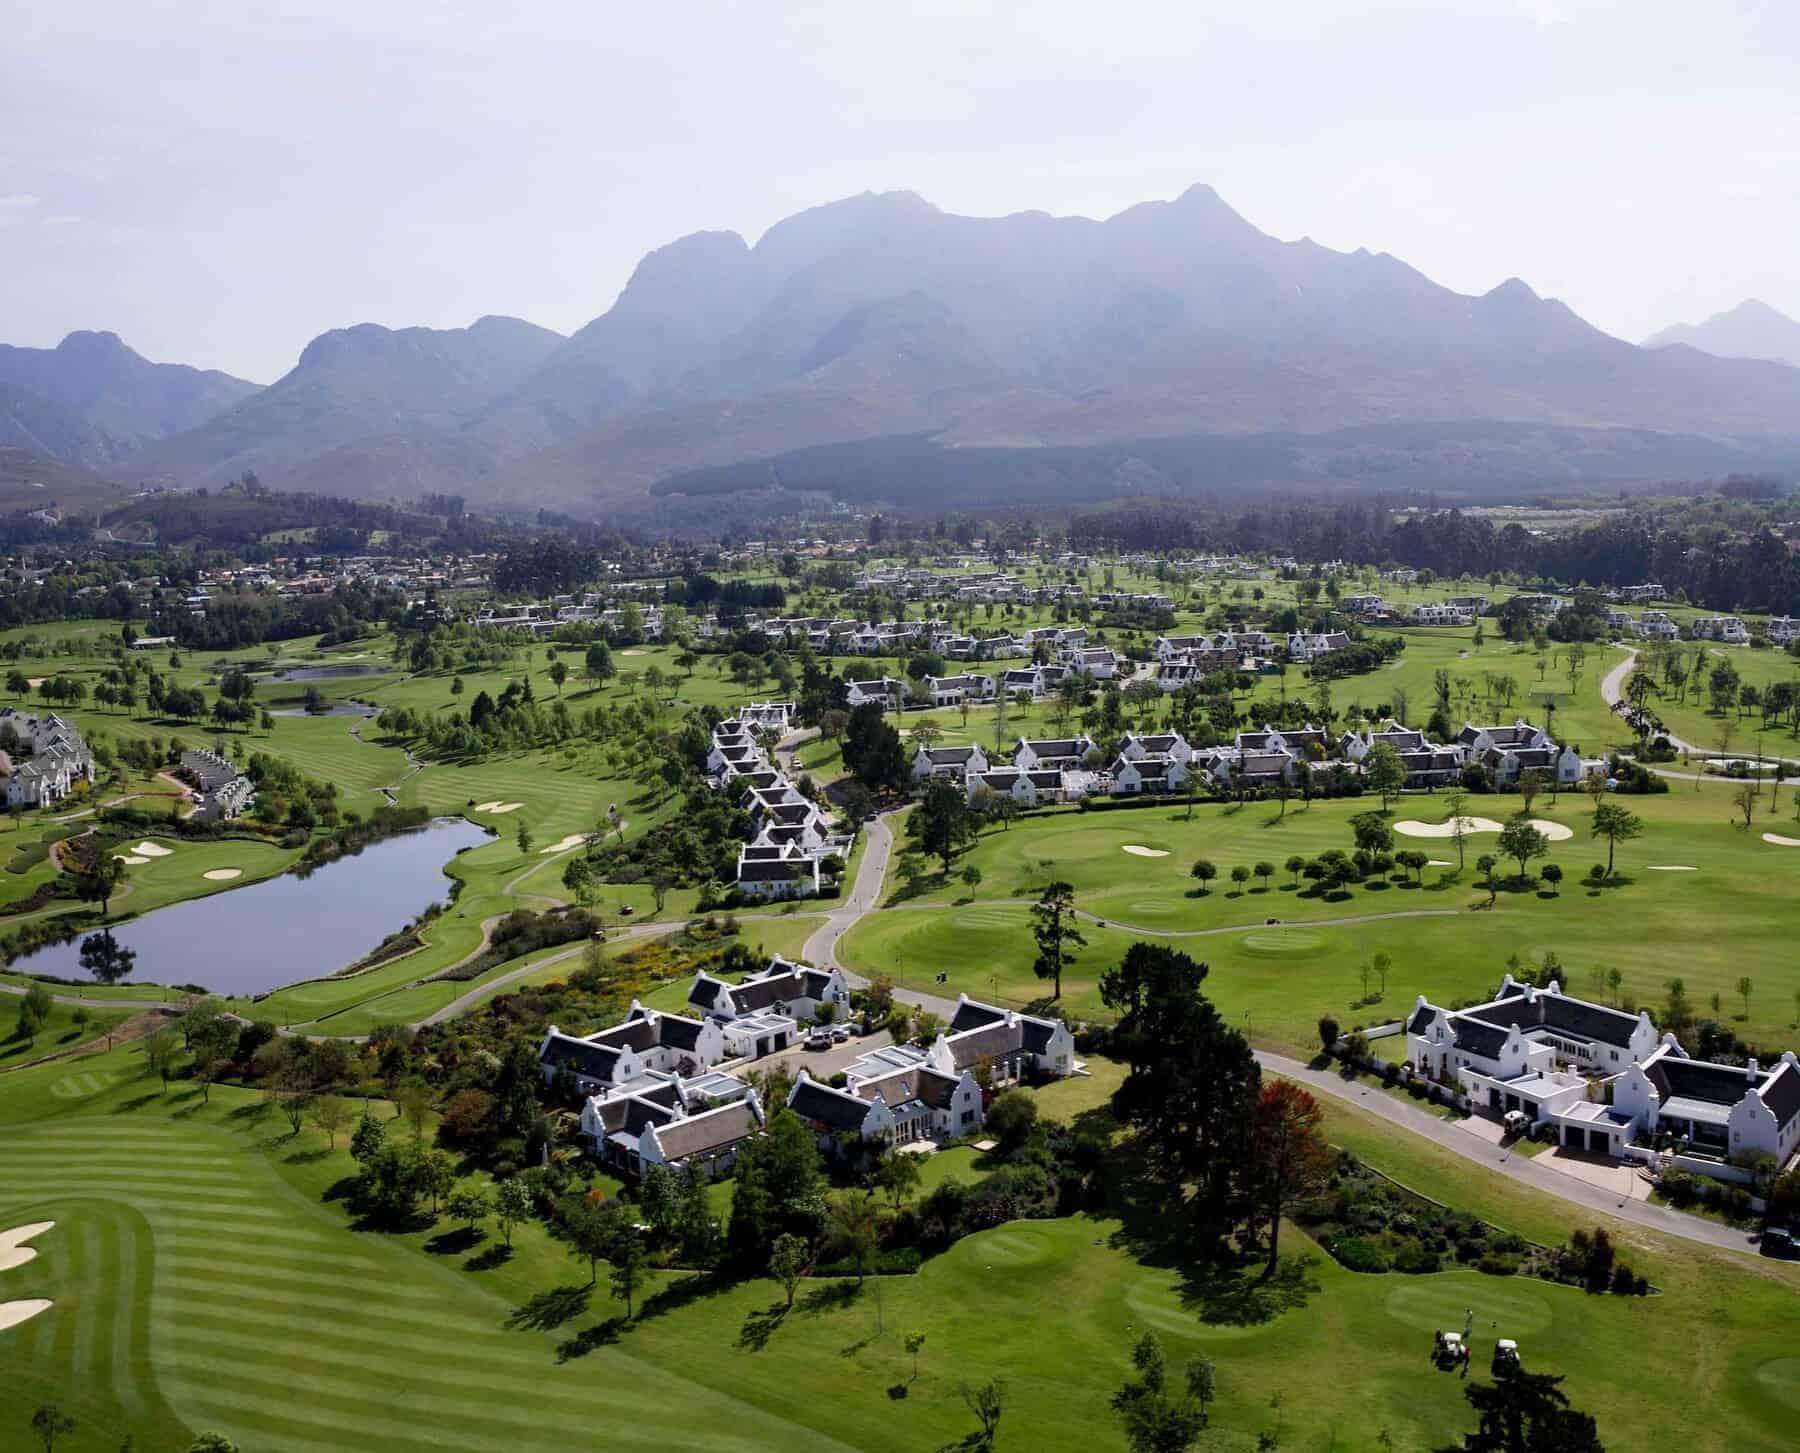 Fancourt golf course